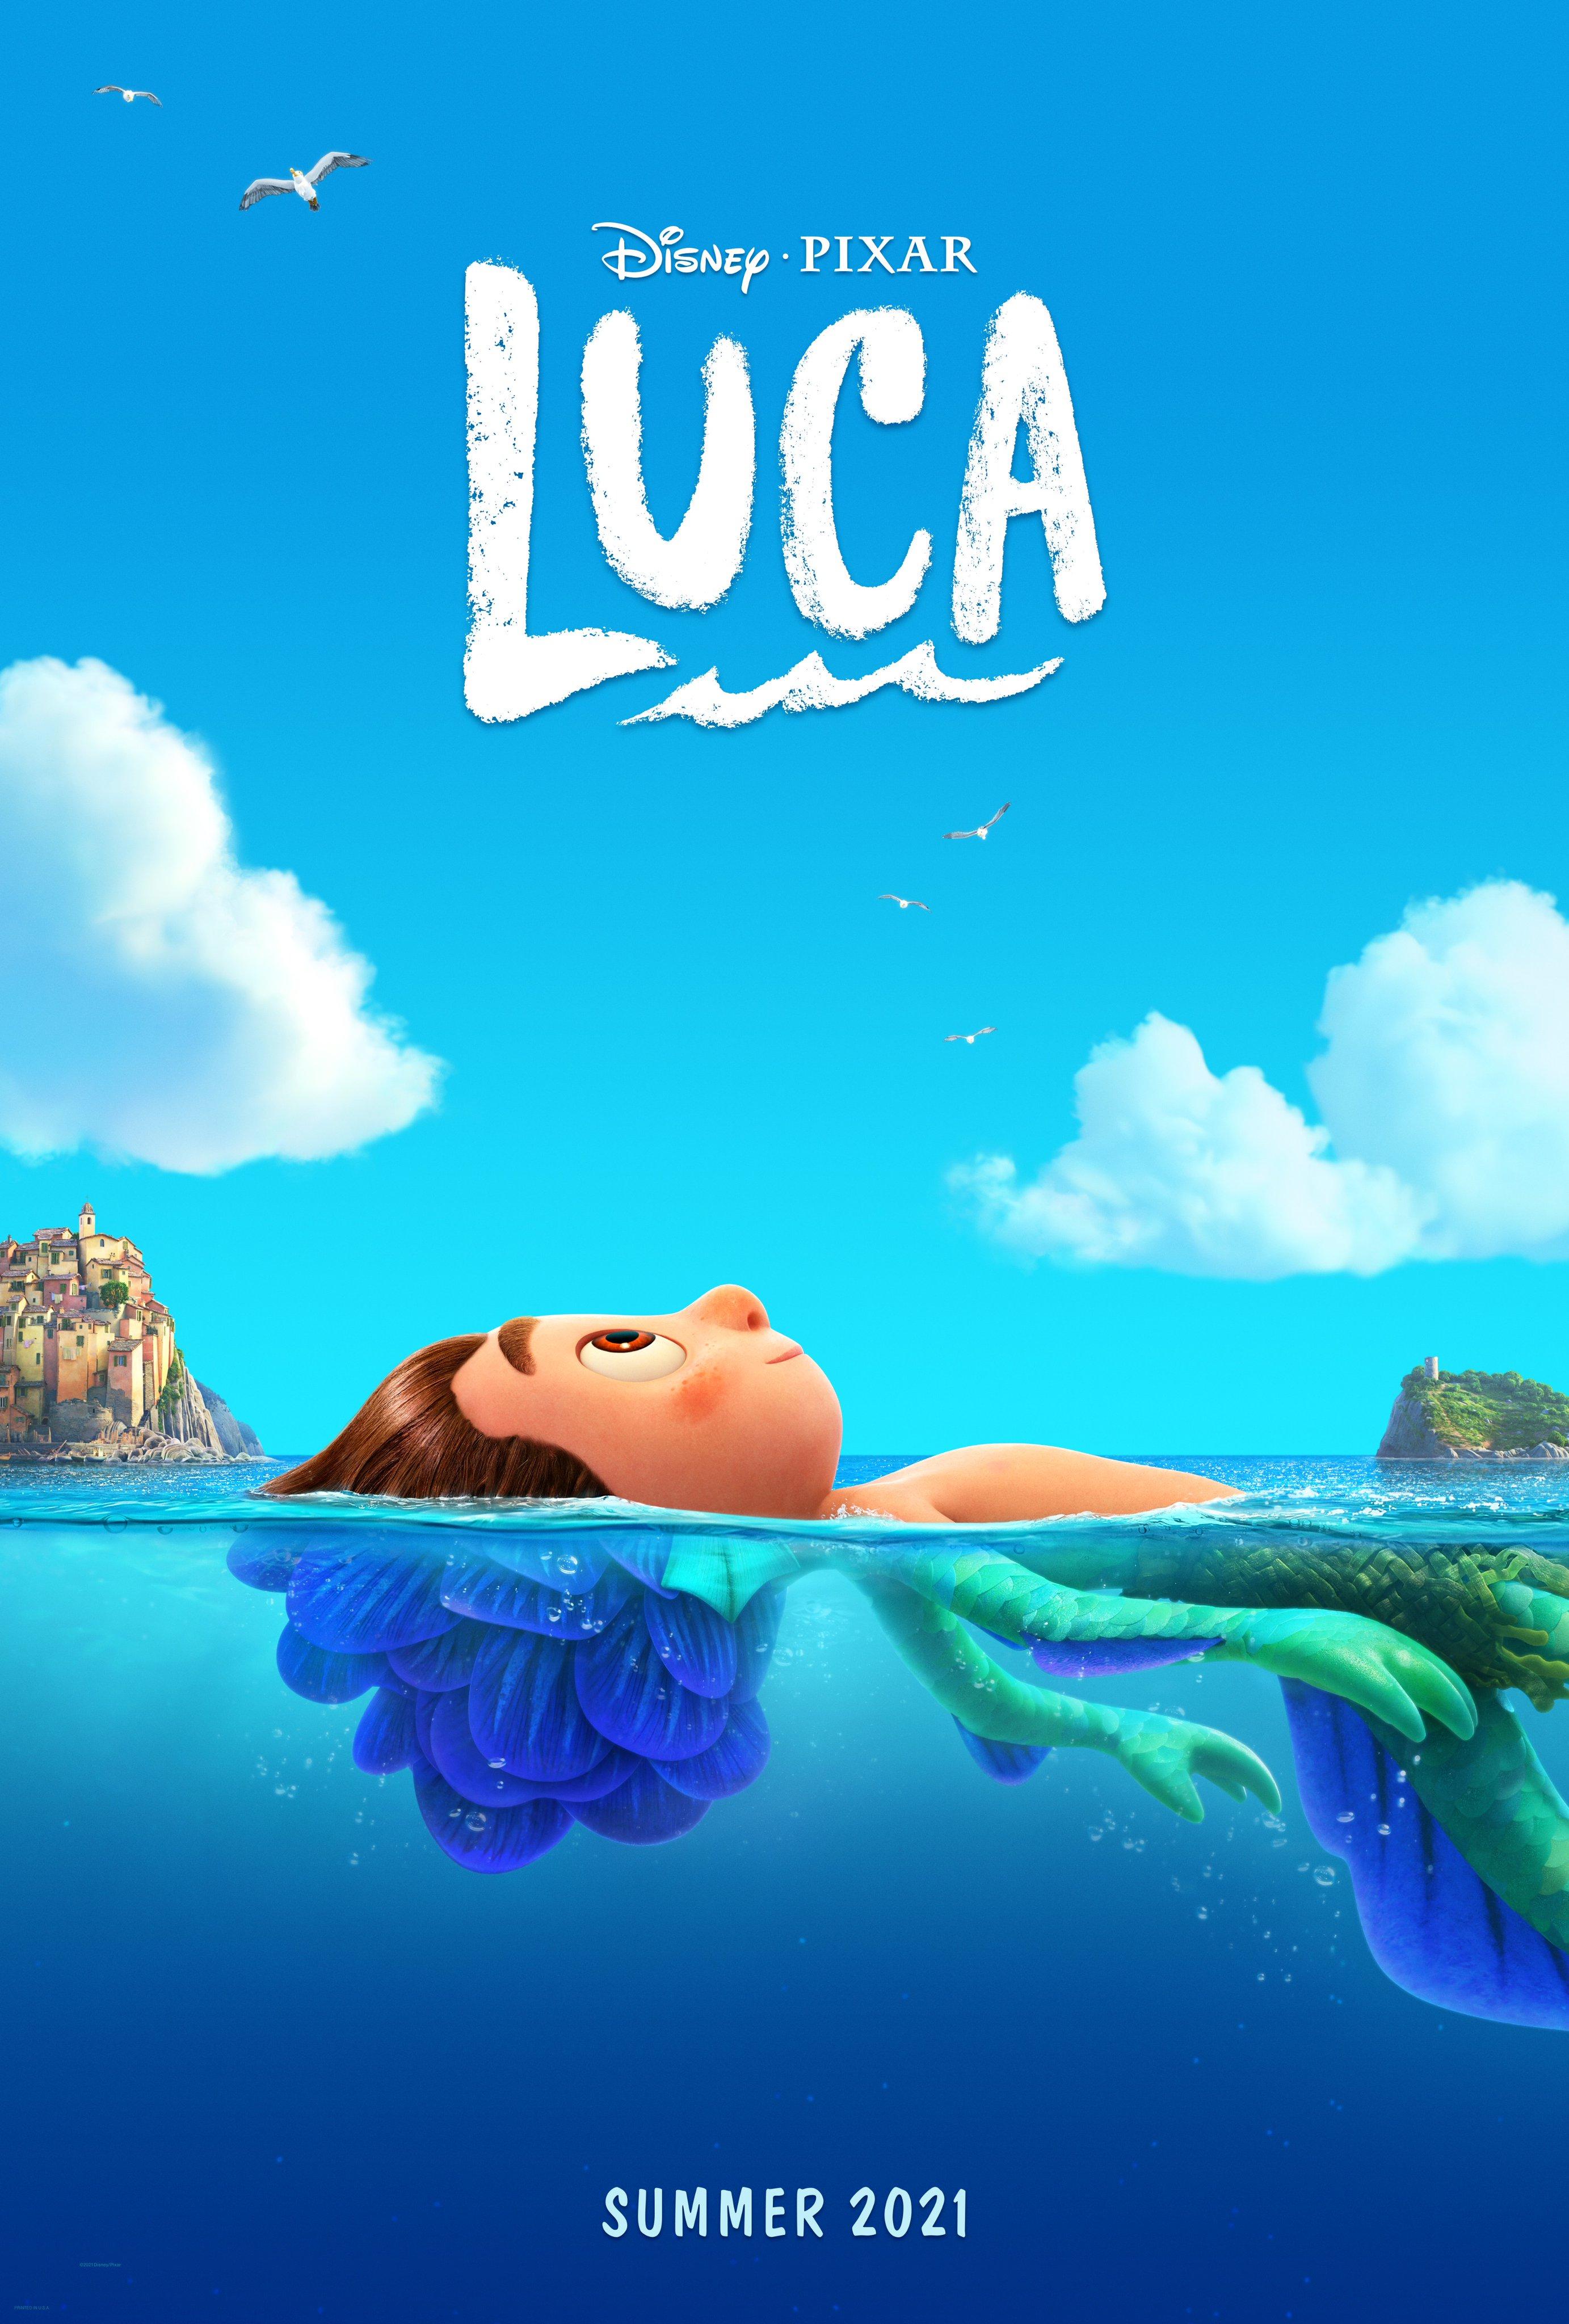 Luca [Pixar - 2021] - Page 2 Eu_xtmPVgAIlHwU?format=jpg&name=4096x4096